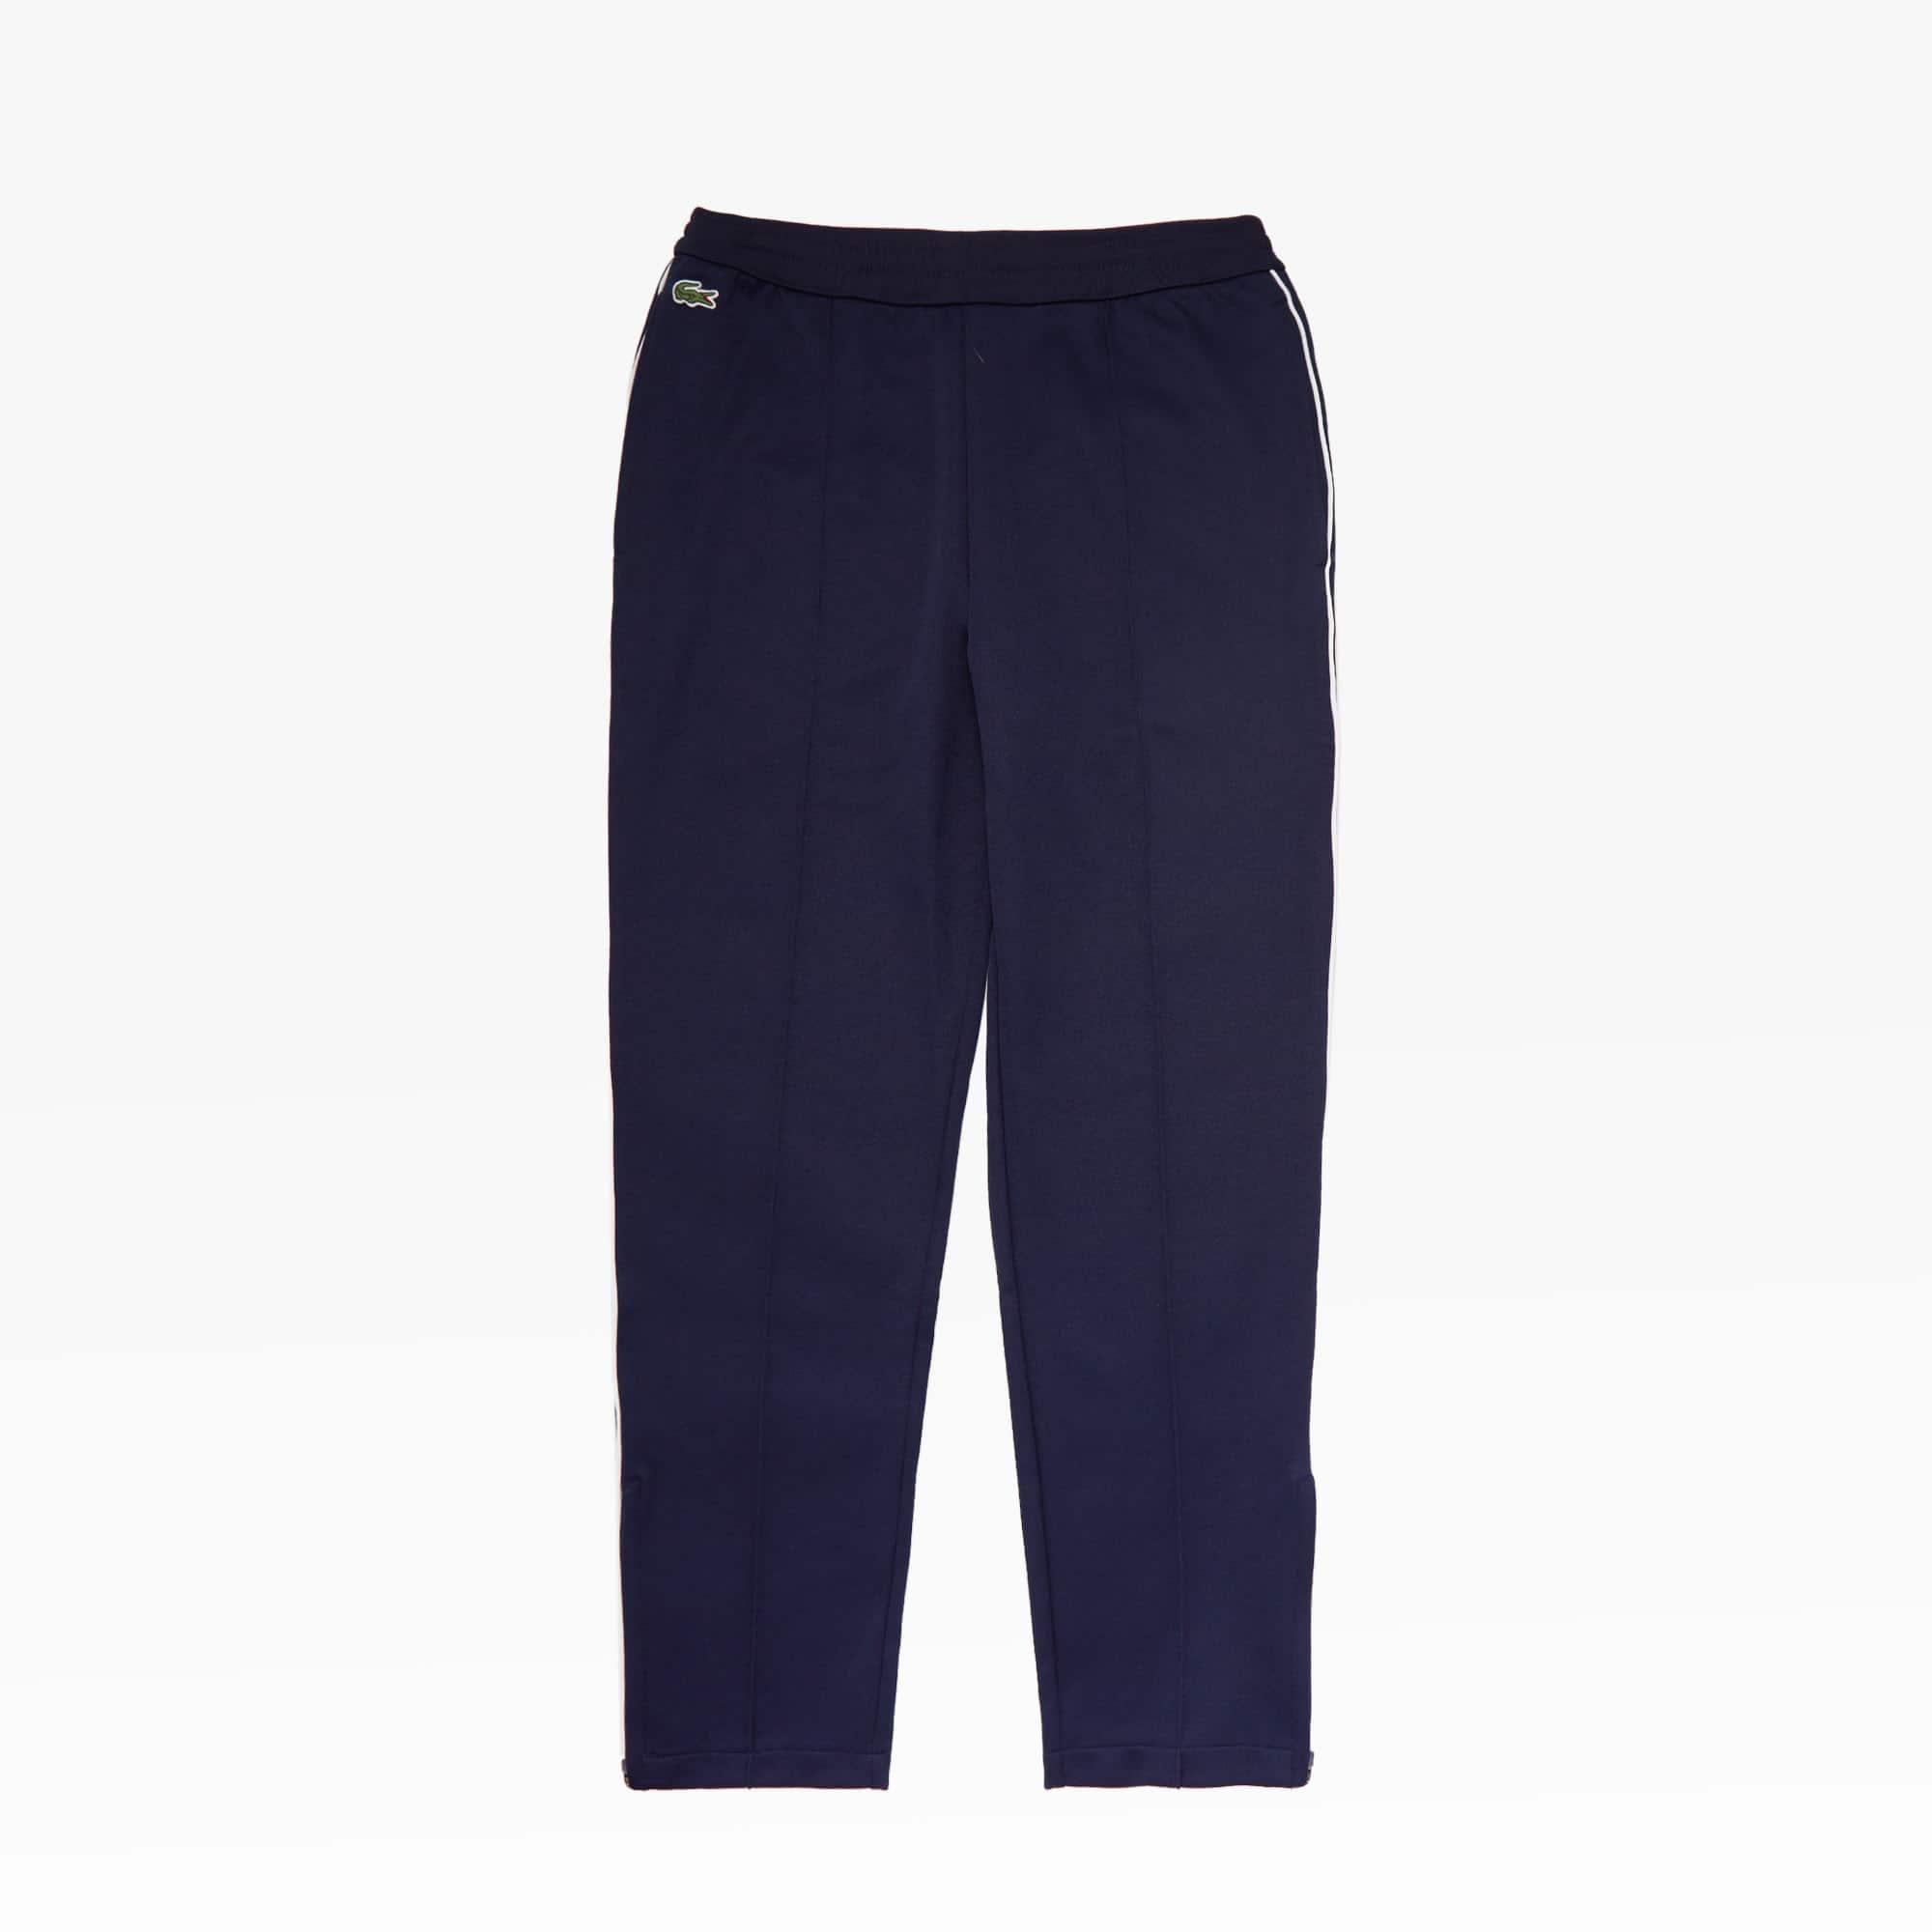 Mens 라코스테 Lacoste SPORT Run-resistant Pleated Tracksuit Pants